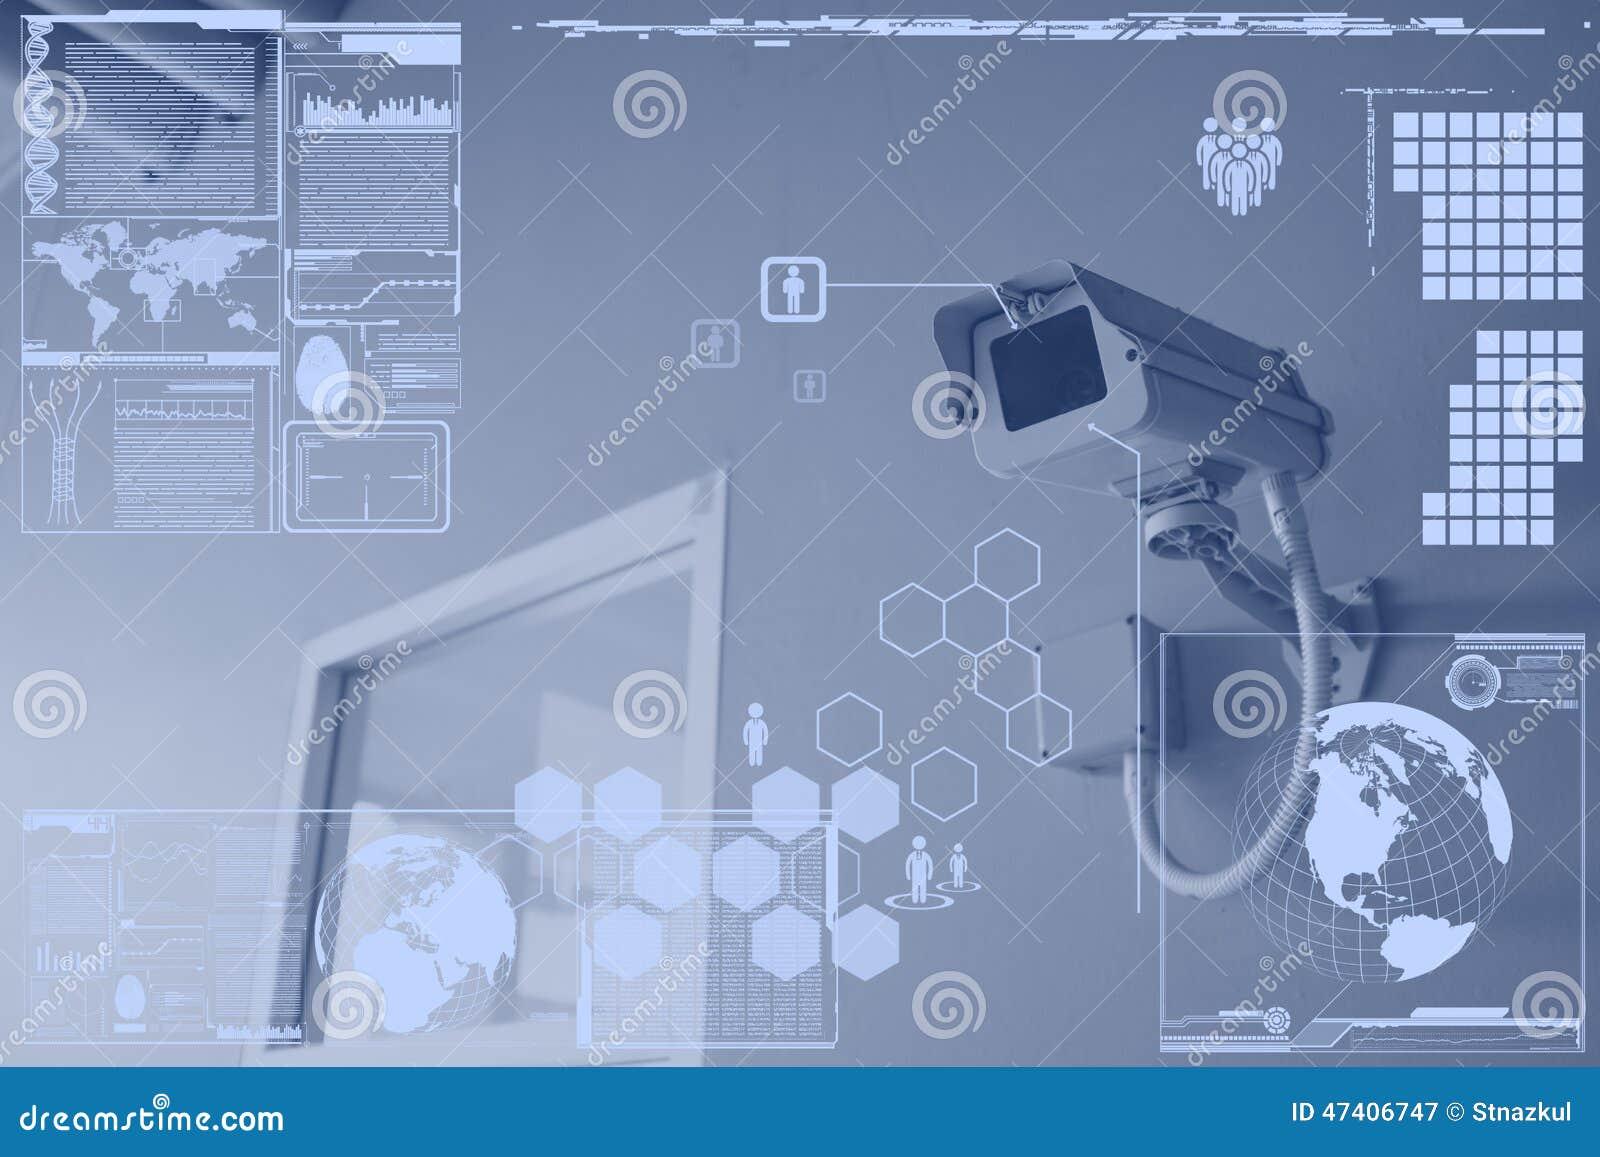 Cctv Camera Or Surveillance Technology On Screen Display